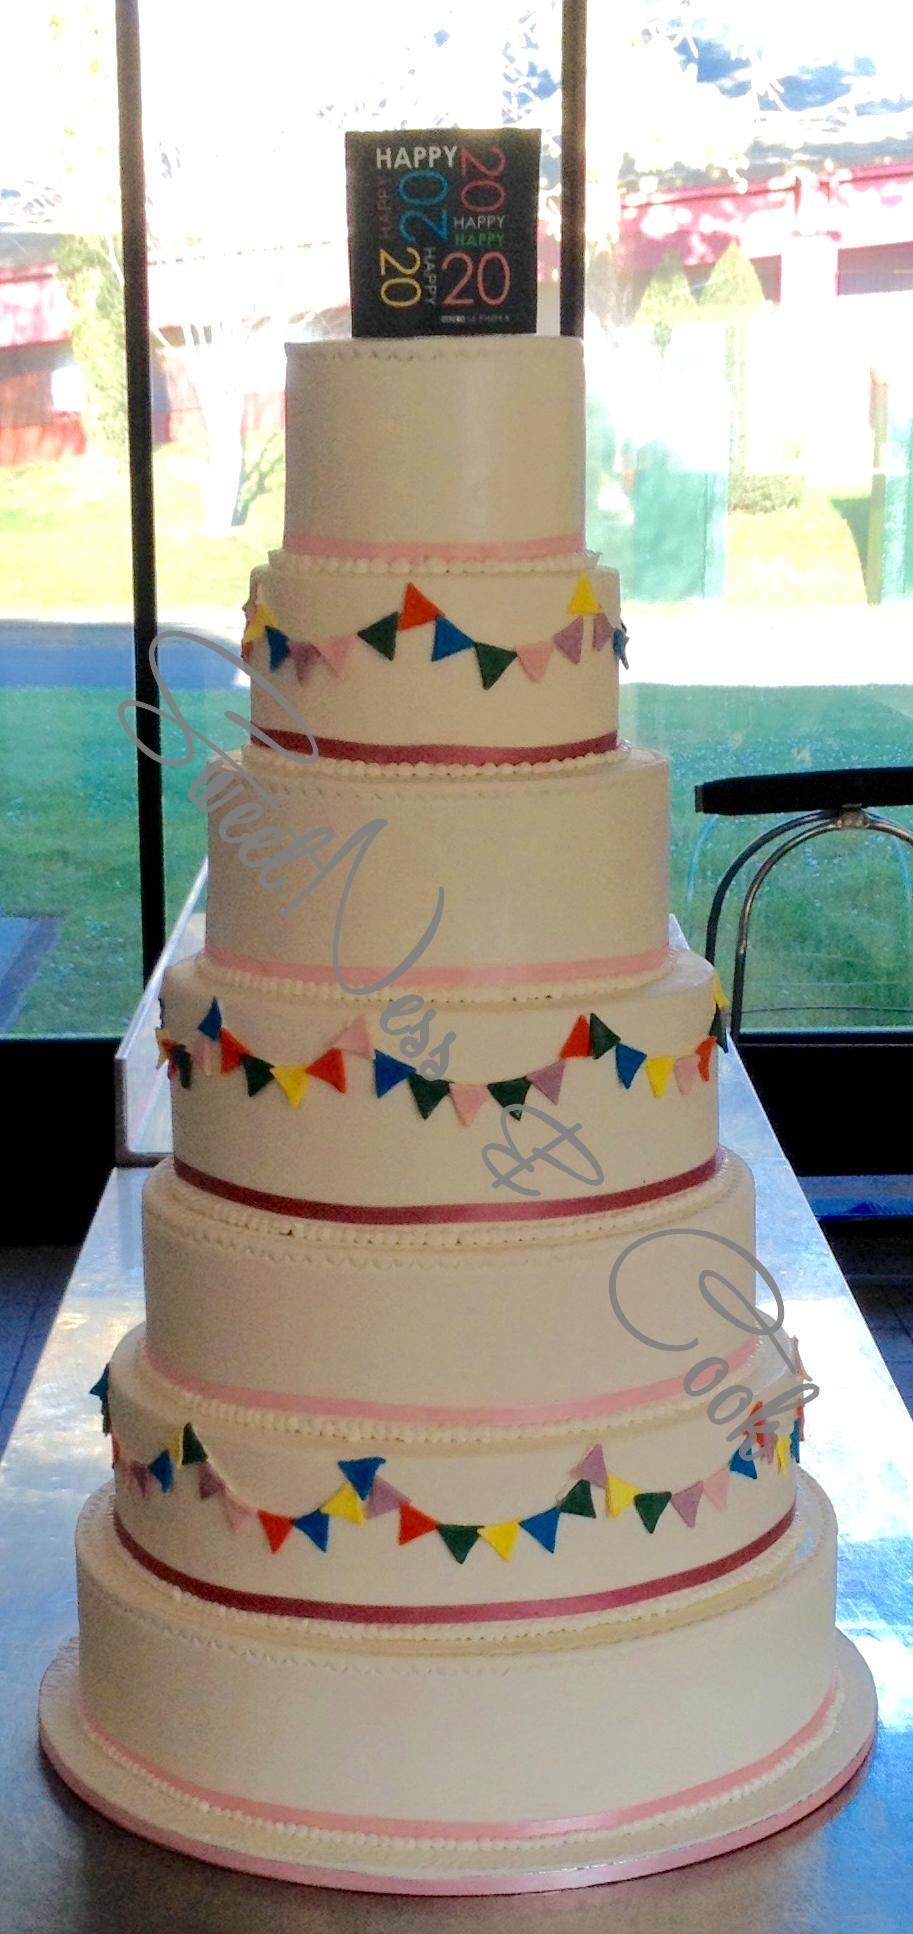 Wedding Cake Sephora